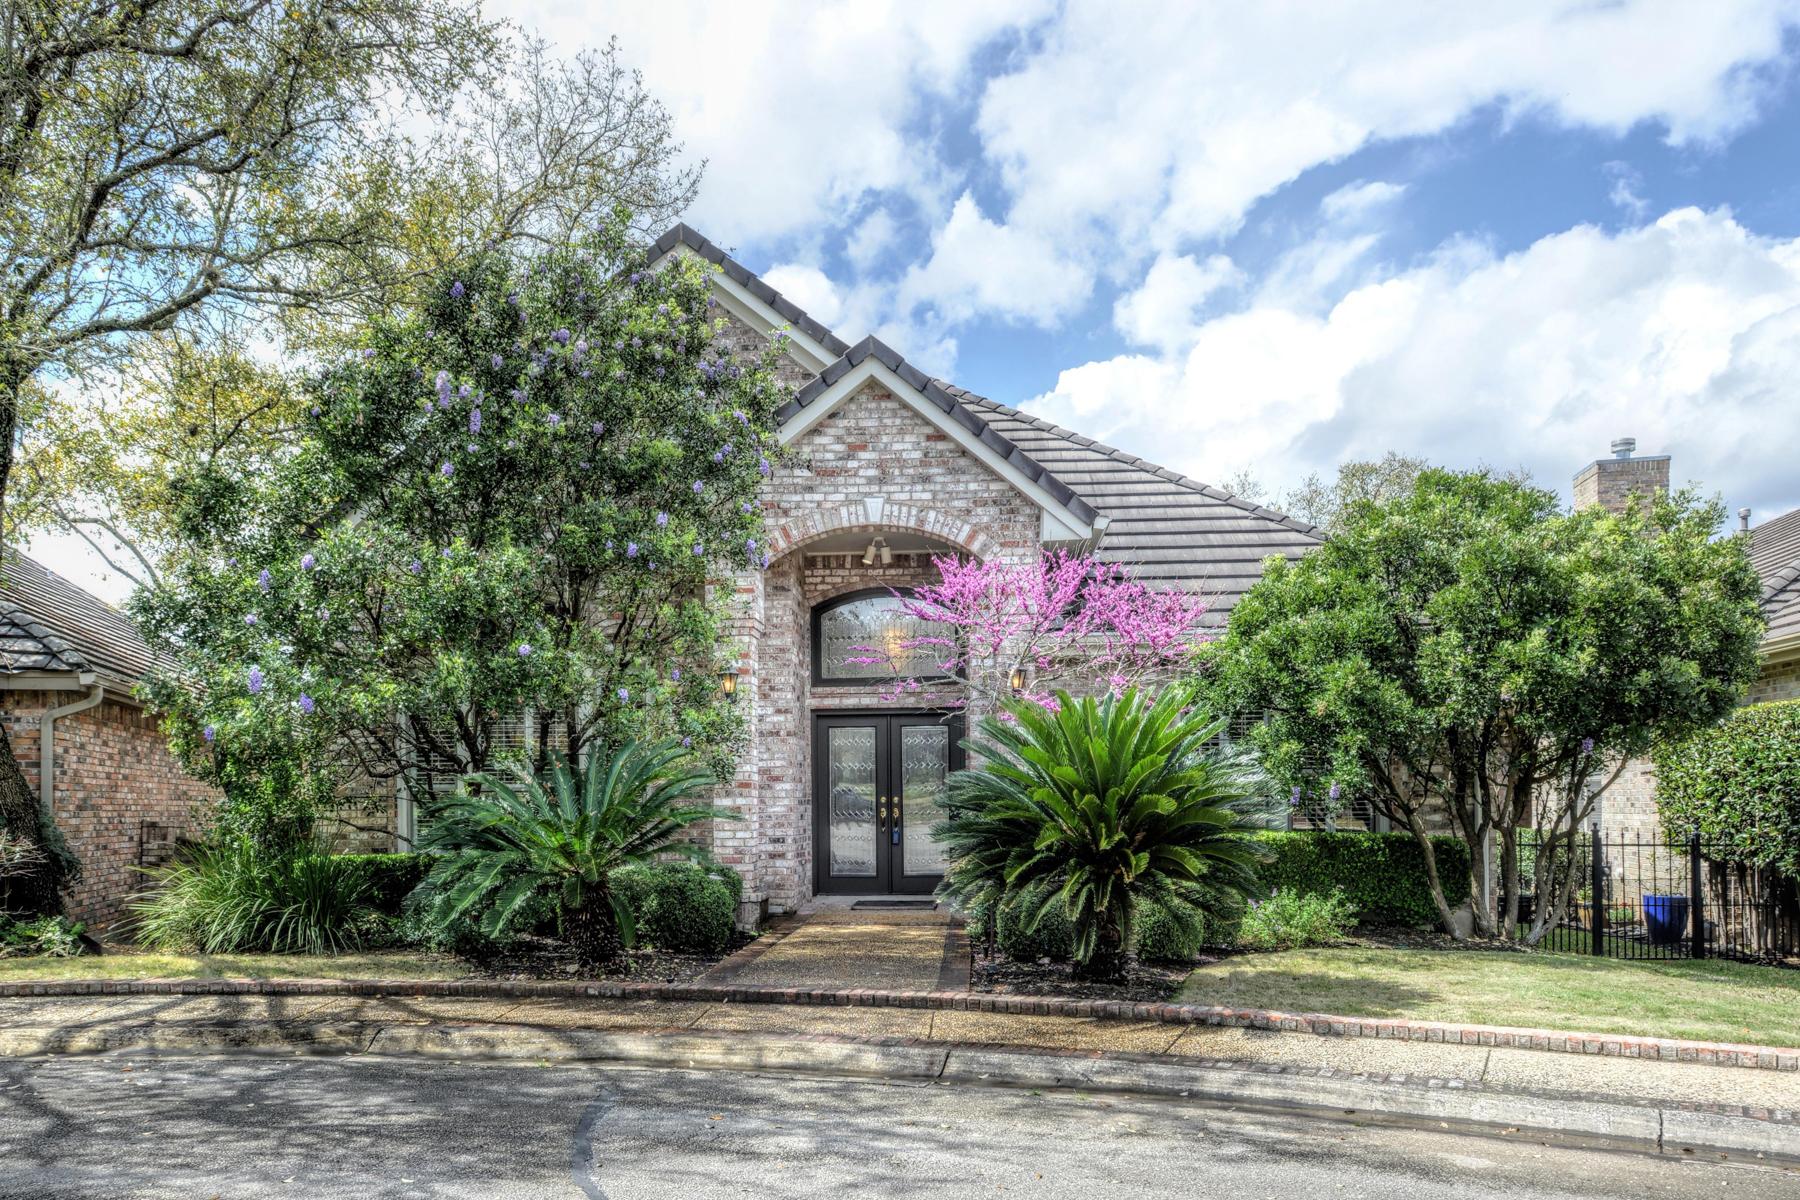 Casa Unifamiliar por un Venta en Stunning Dominion Garden Home 4 Hendon Ln San Antonio, Texas 78257 Estados Unidos